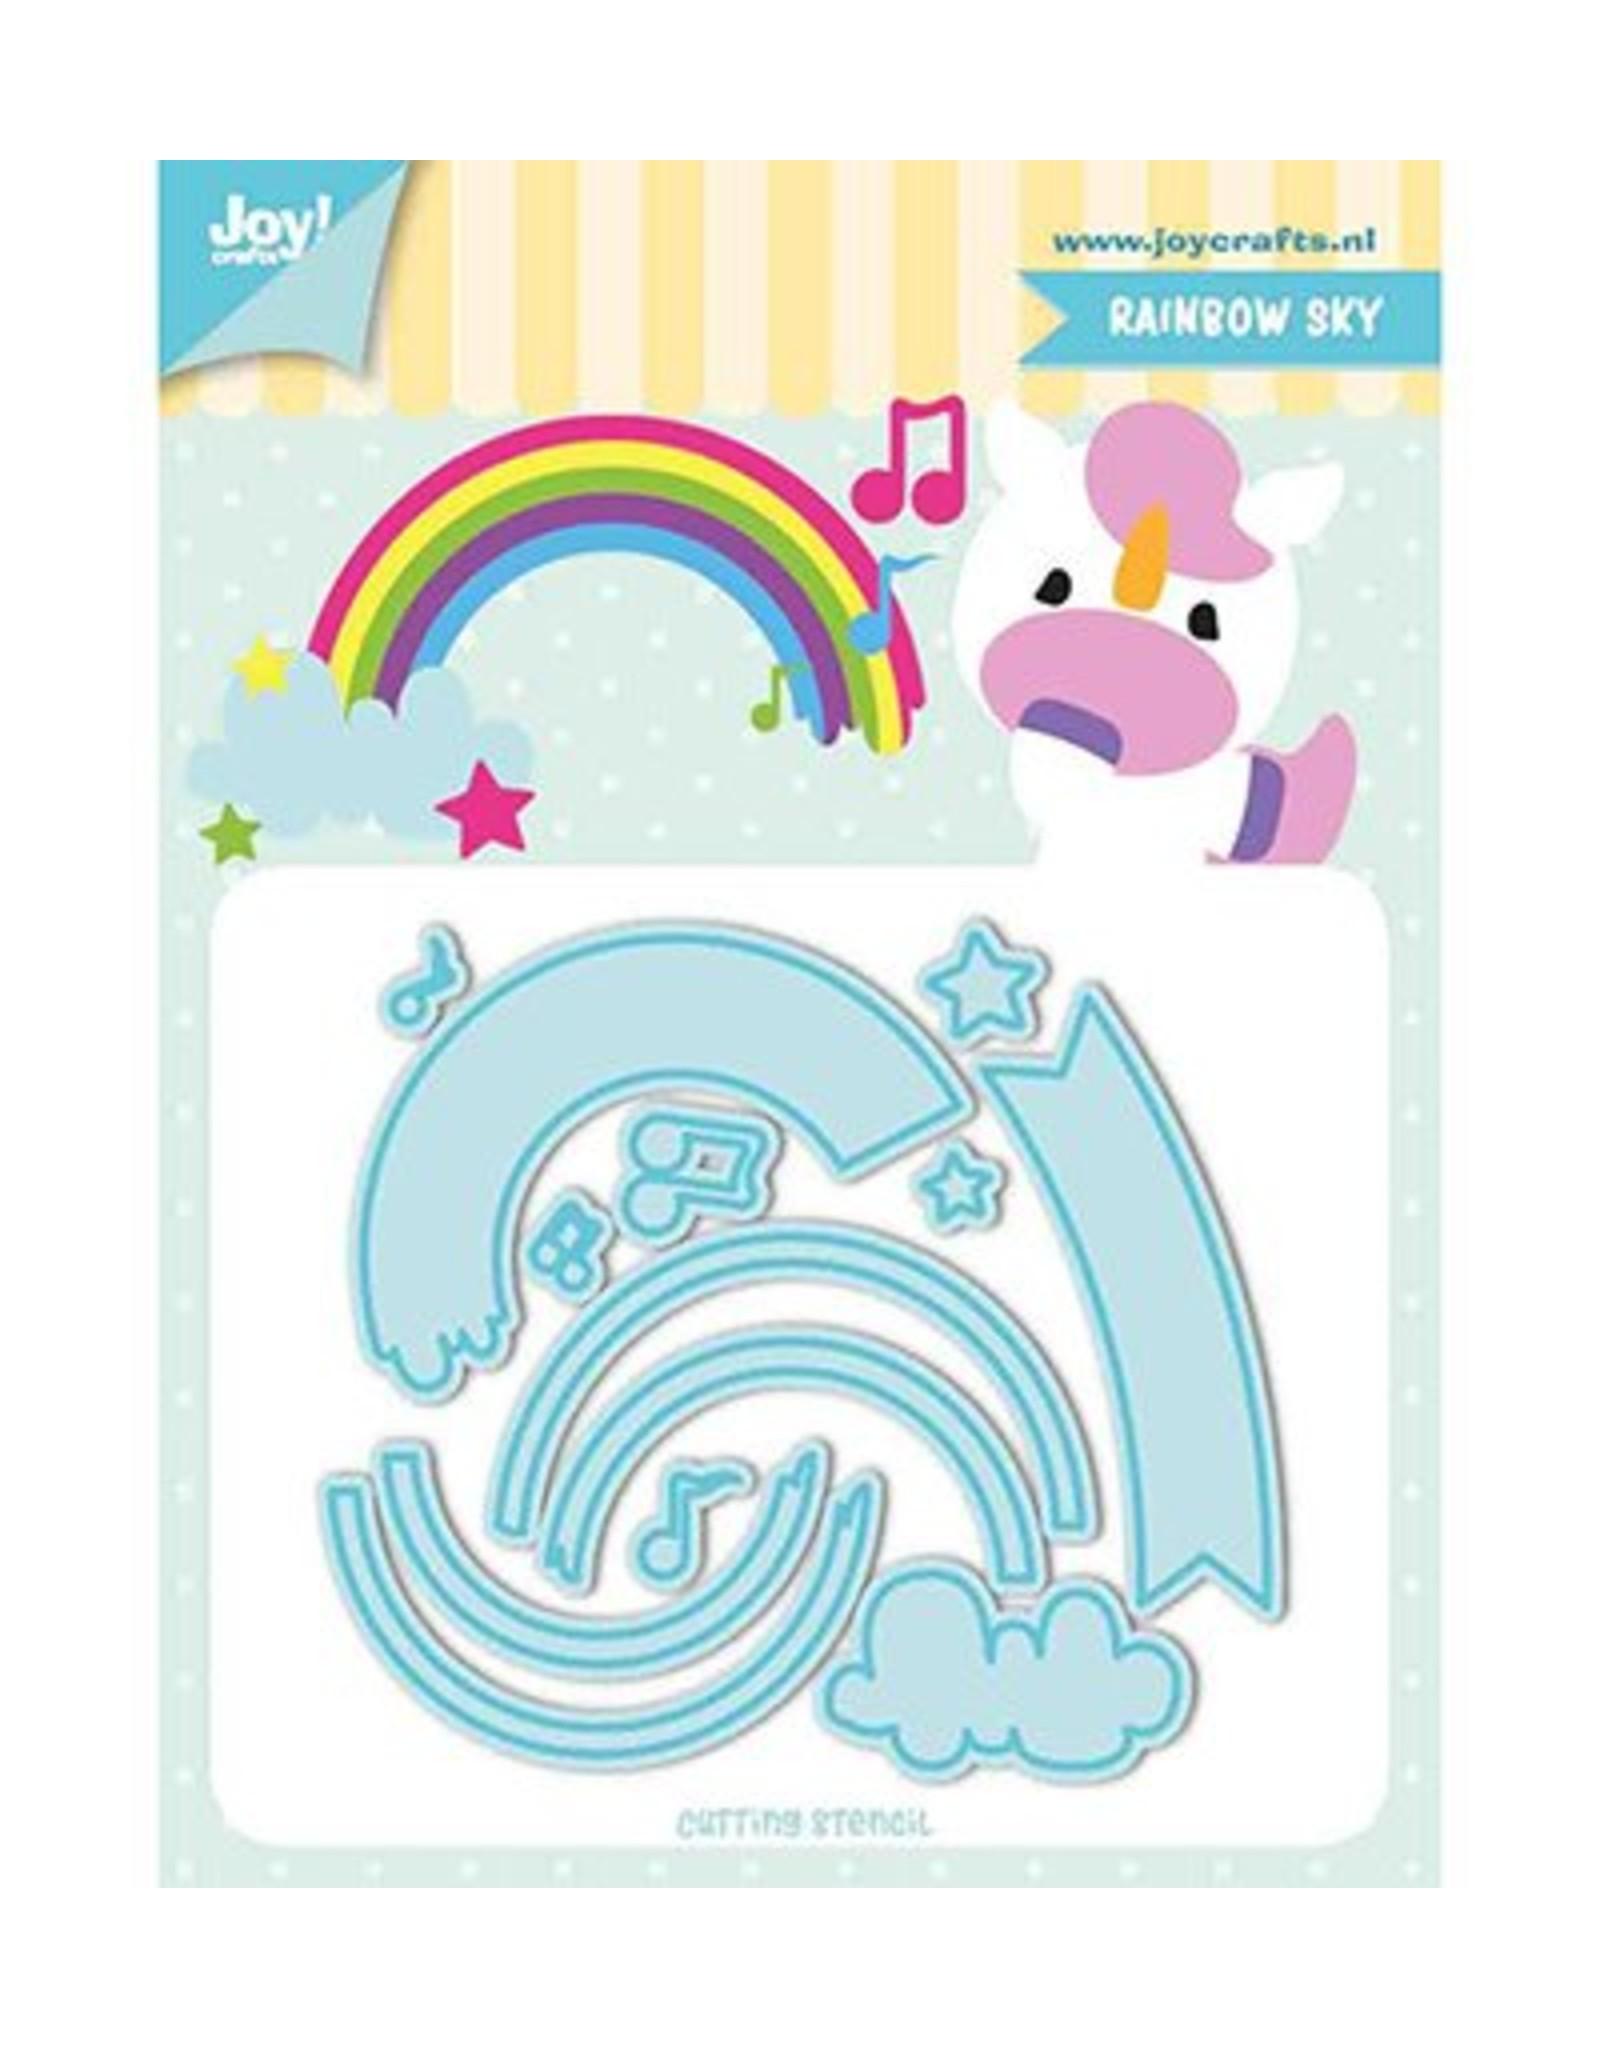 Joy Craft Joy Crafts Snij-stencils - Tumble Friends - Rainbow-sky 6002/1195